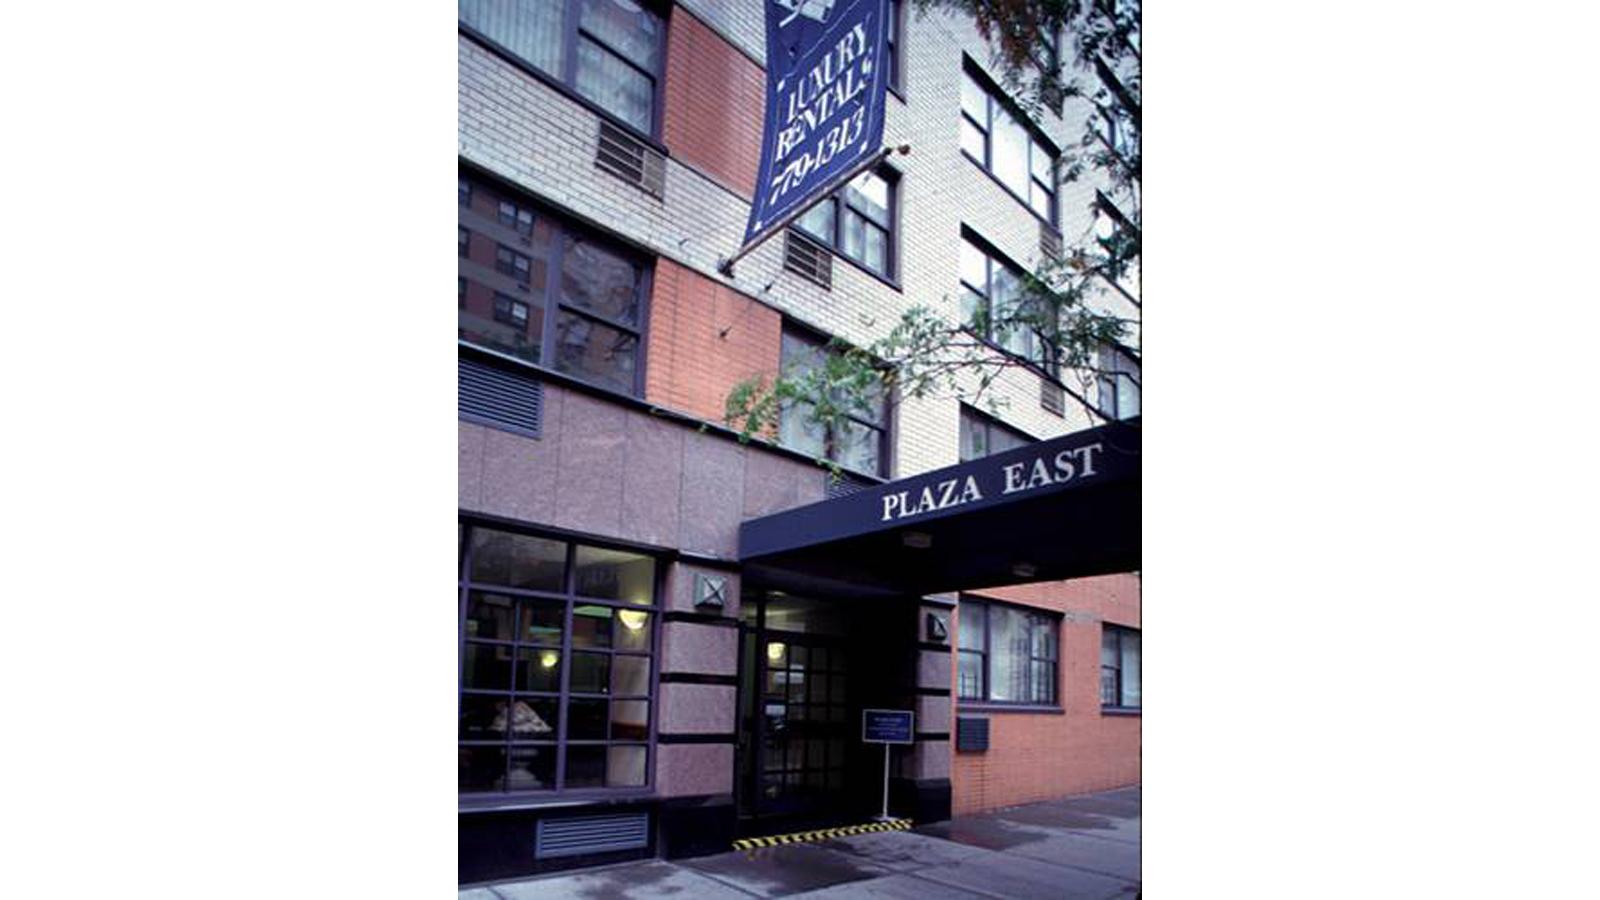 Plaza East, 340 East 34th Street